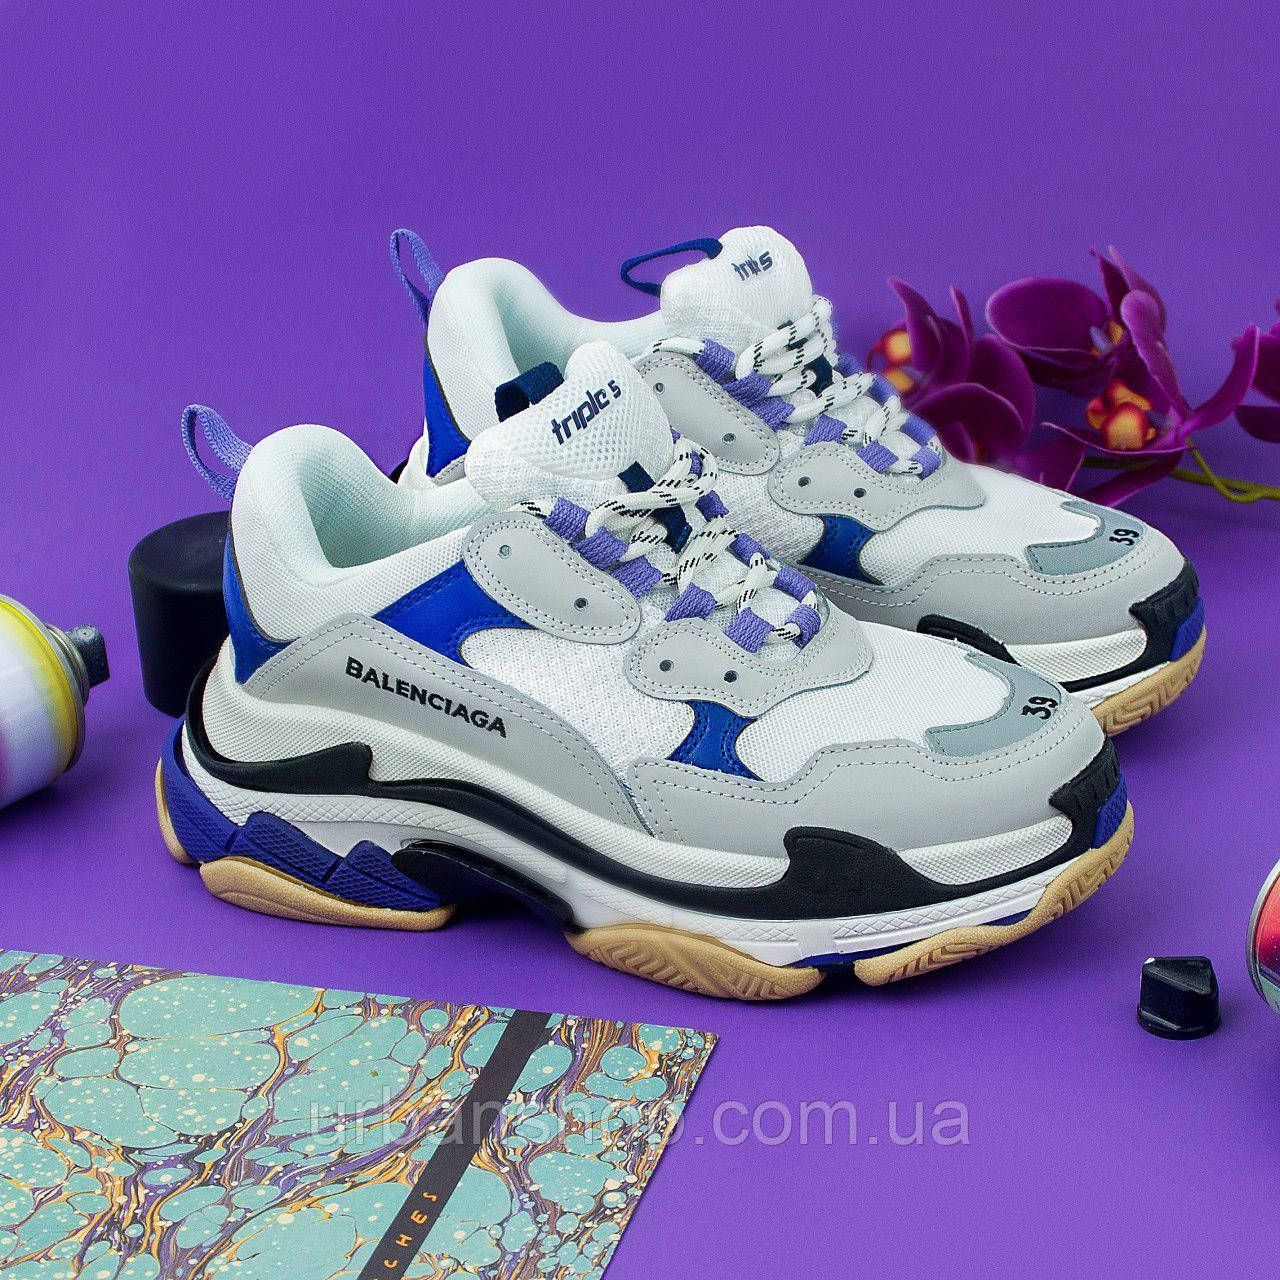 Взуття Balenciaga Triple S 2 light/violet 36